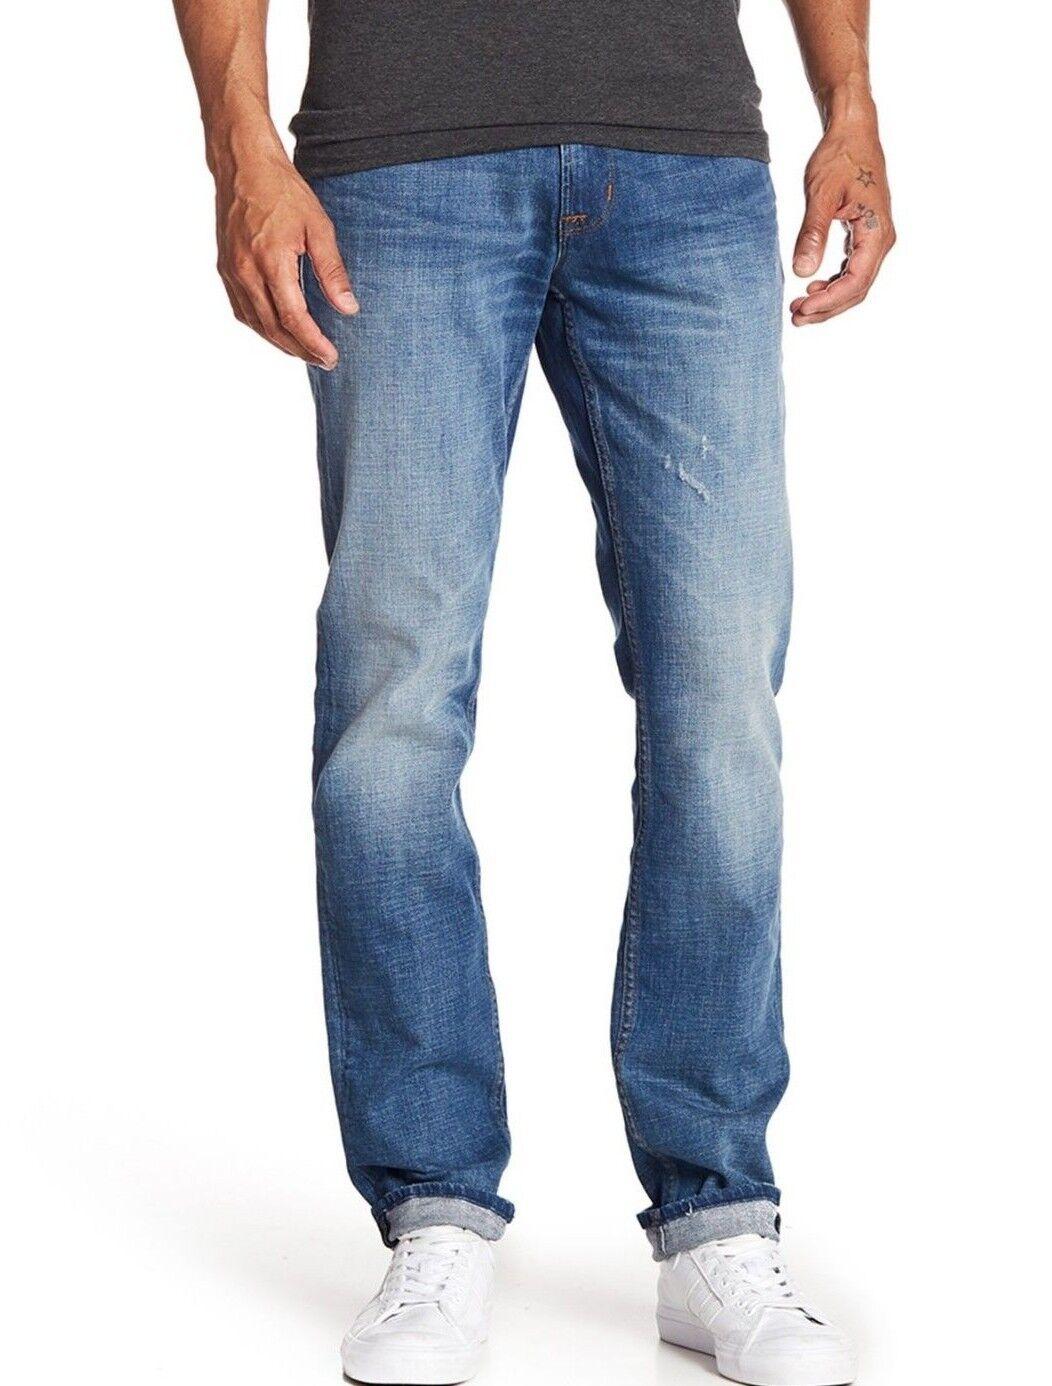 NWT HUDSON JEANS Sz38 BLAKE SLIM STRAIGHT STRETCH jeans DOLLISON blueE